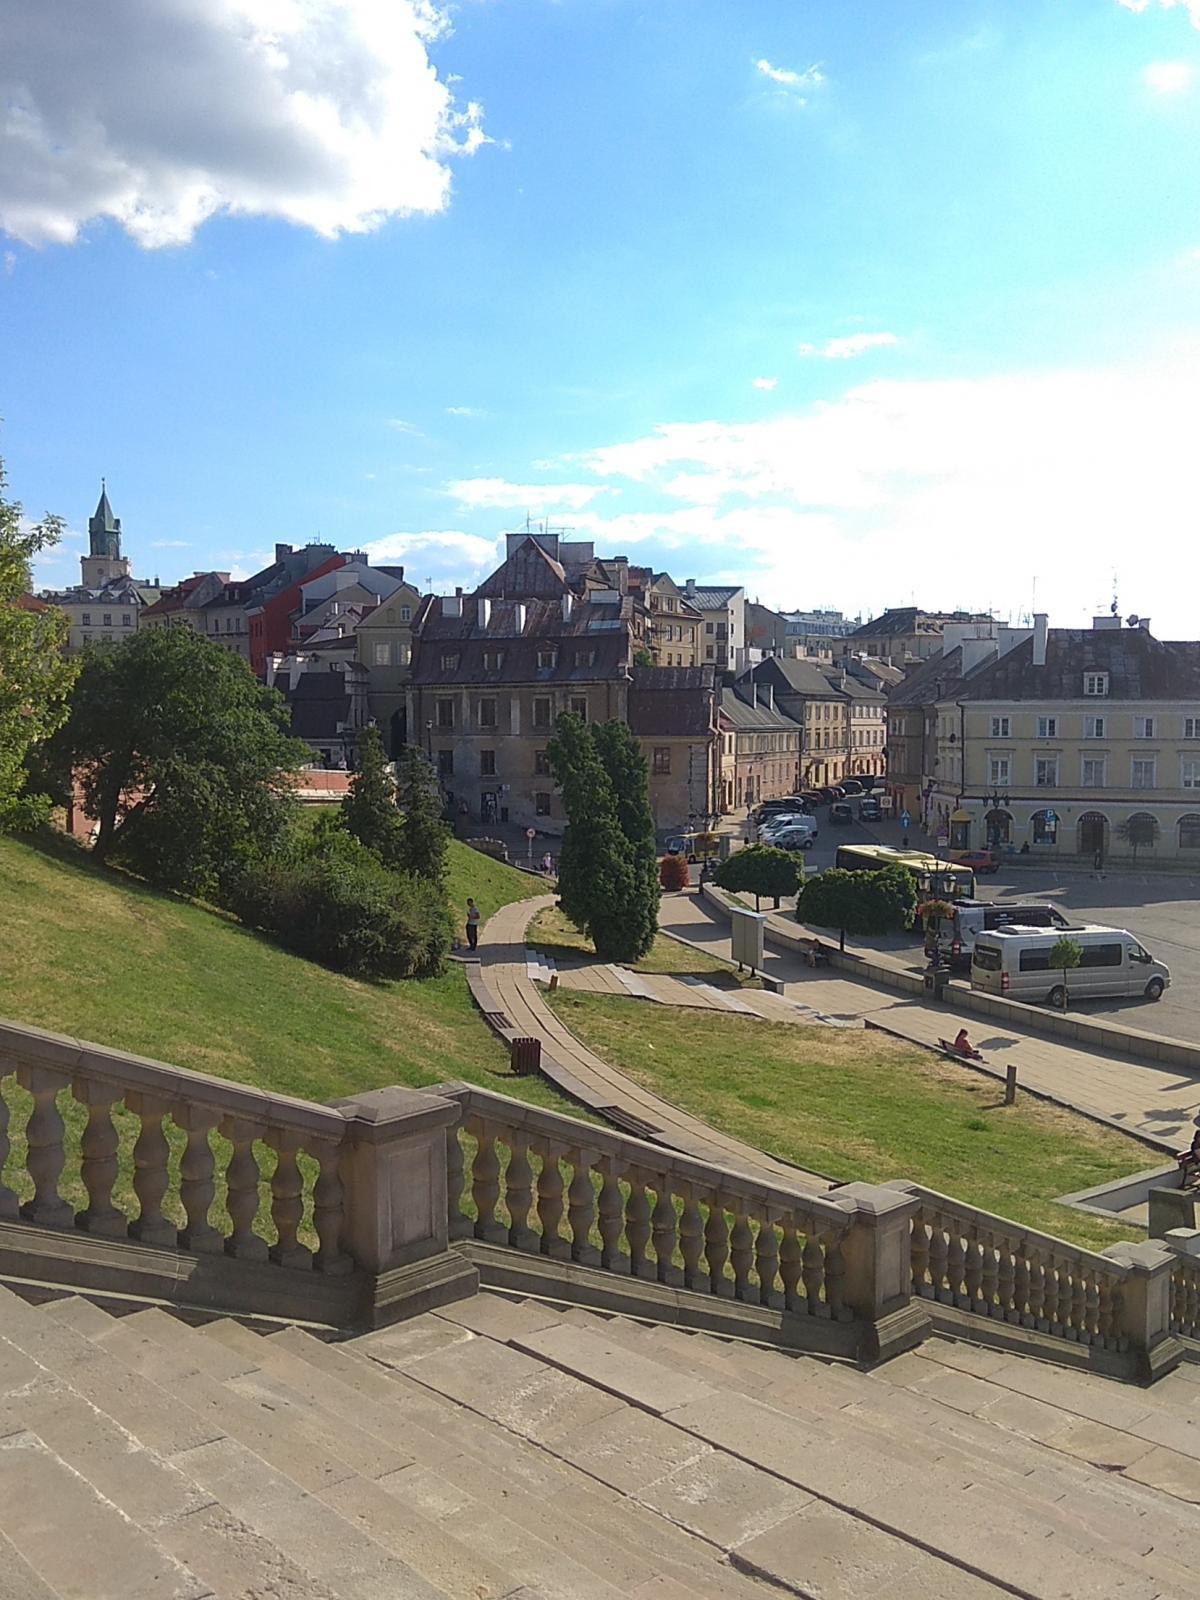 Замковая площадь, вид слева / фото Варвара Вайс